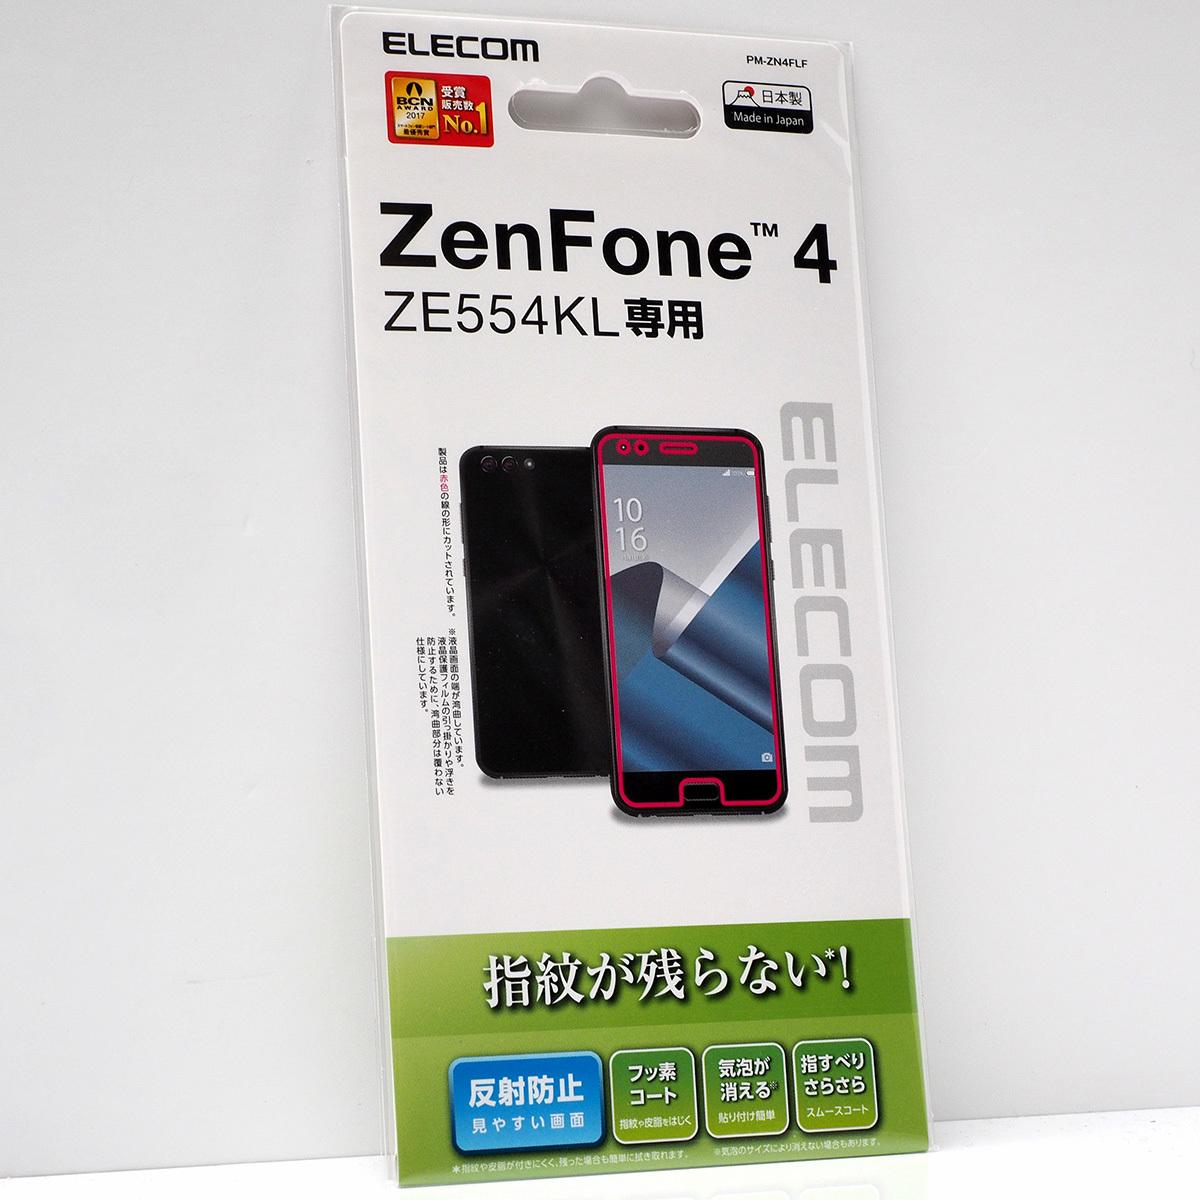 ASUS ZenFone 4 ZE554KL (SIMフリー/MVNOなど) 用 防指紋 反射防止 液晶保護フィルム 未開封品 ZenFone4液晶保護フィルム_画像1